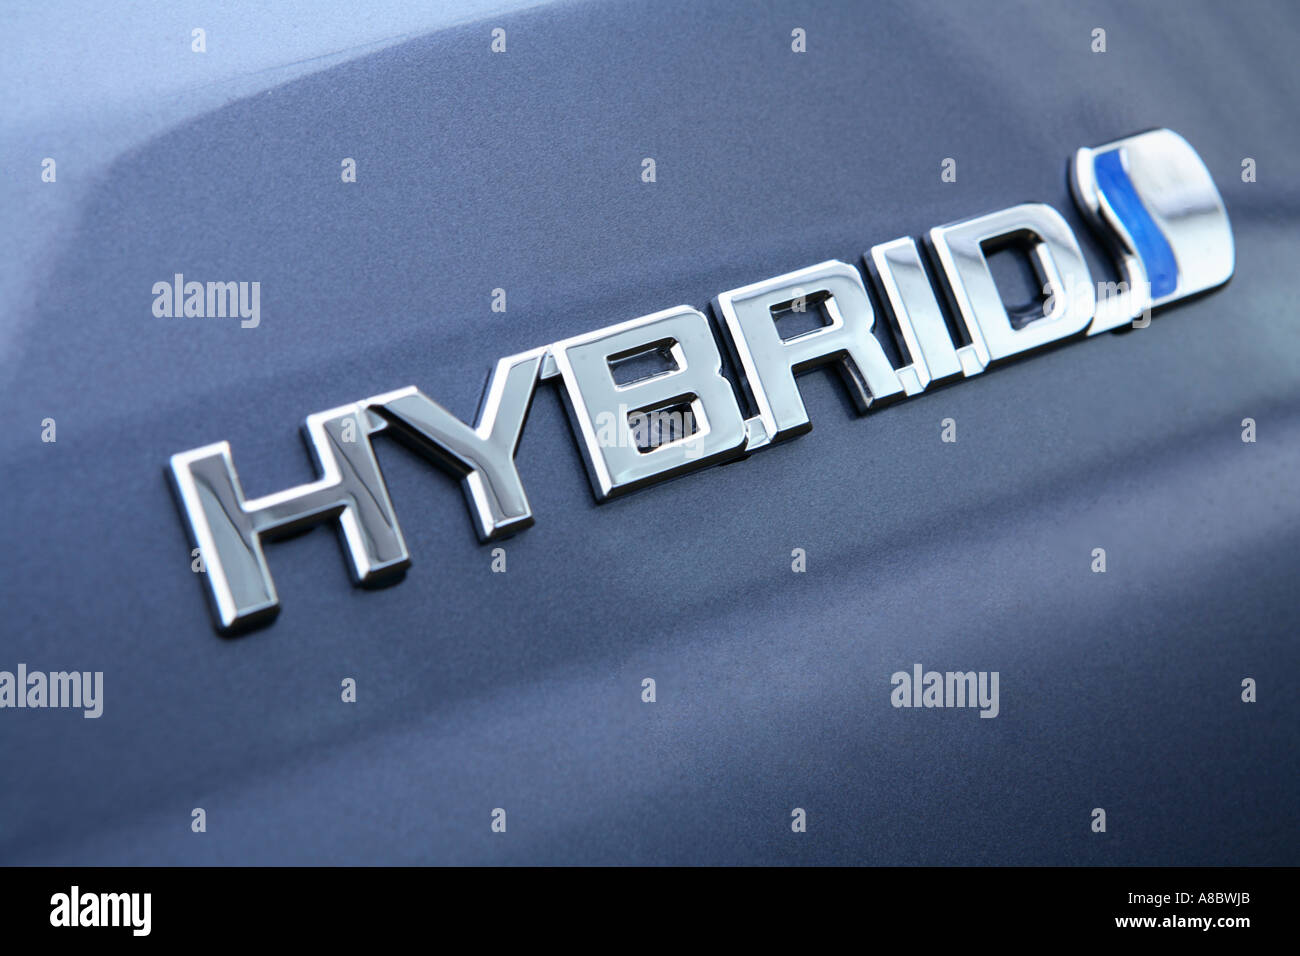 Badge on a 2006 Toyota Highlander Hybrid SUV - Stock Image